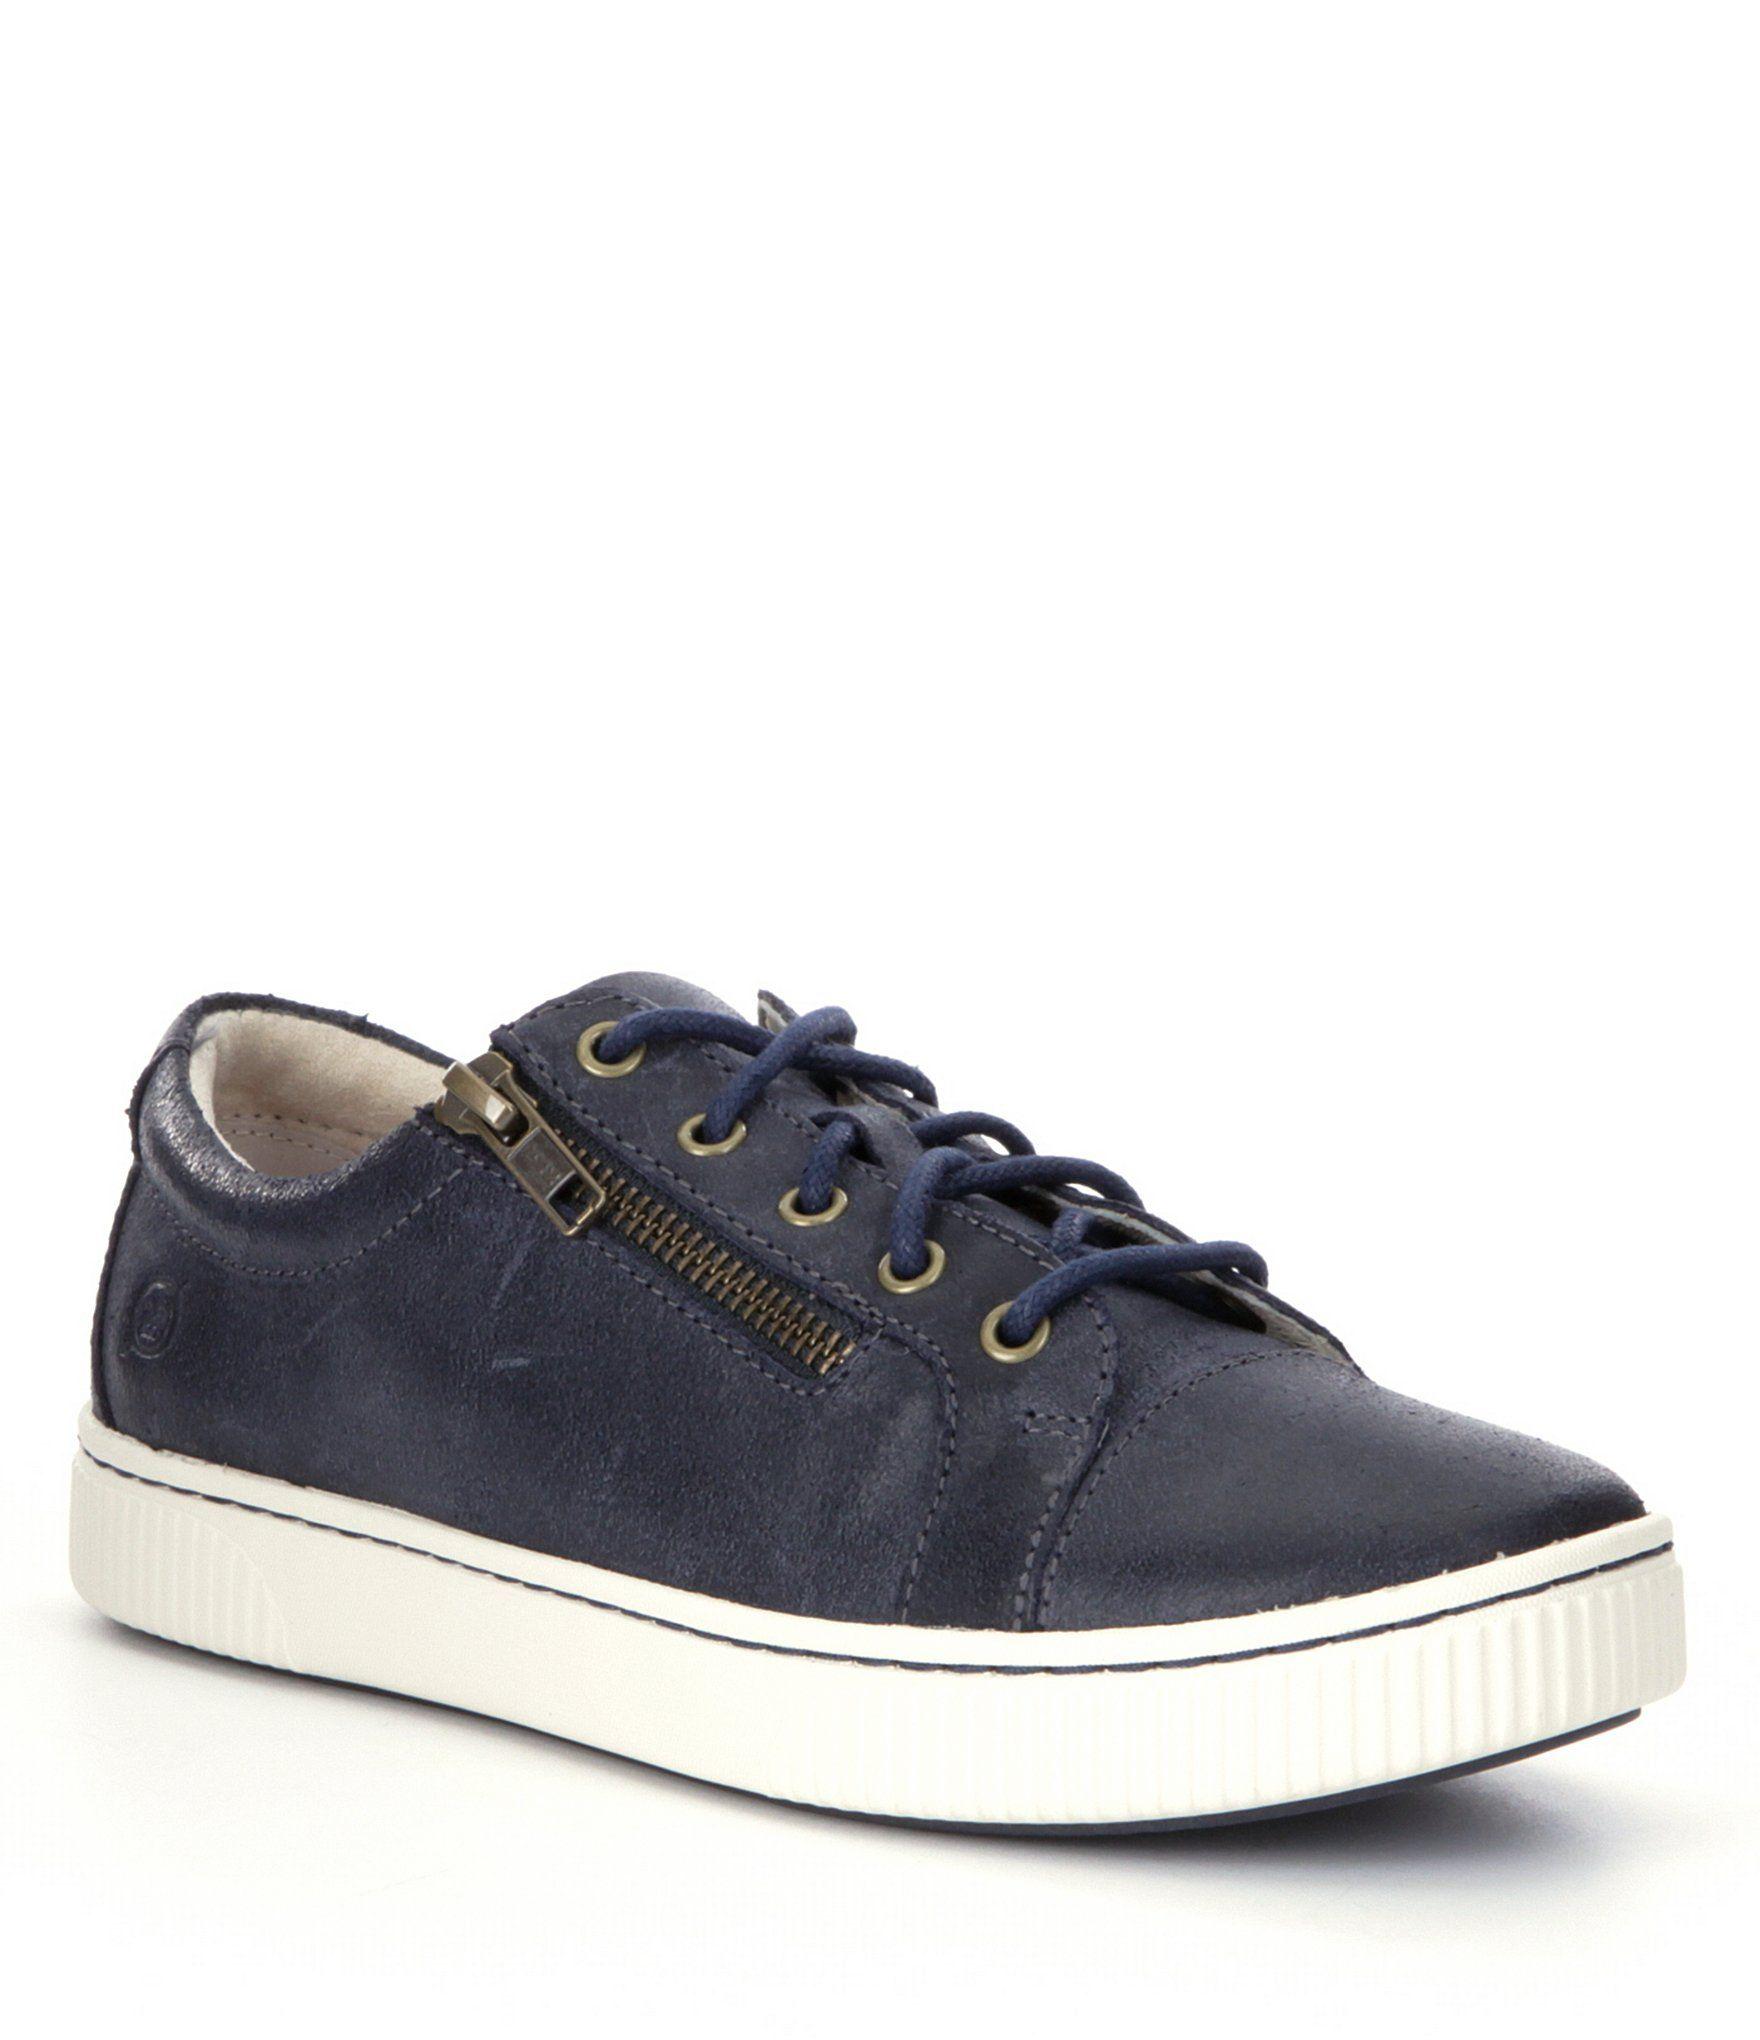 Born Tamara Casual Zip Leather Sneakers – Navy 6.5M